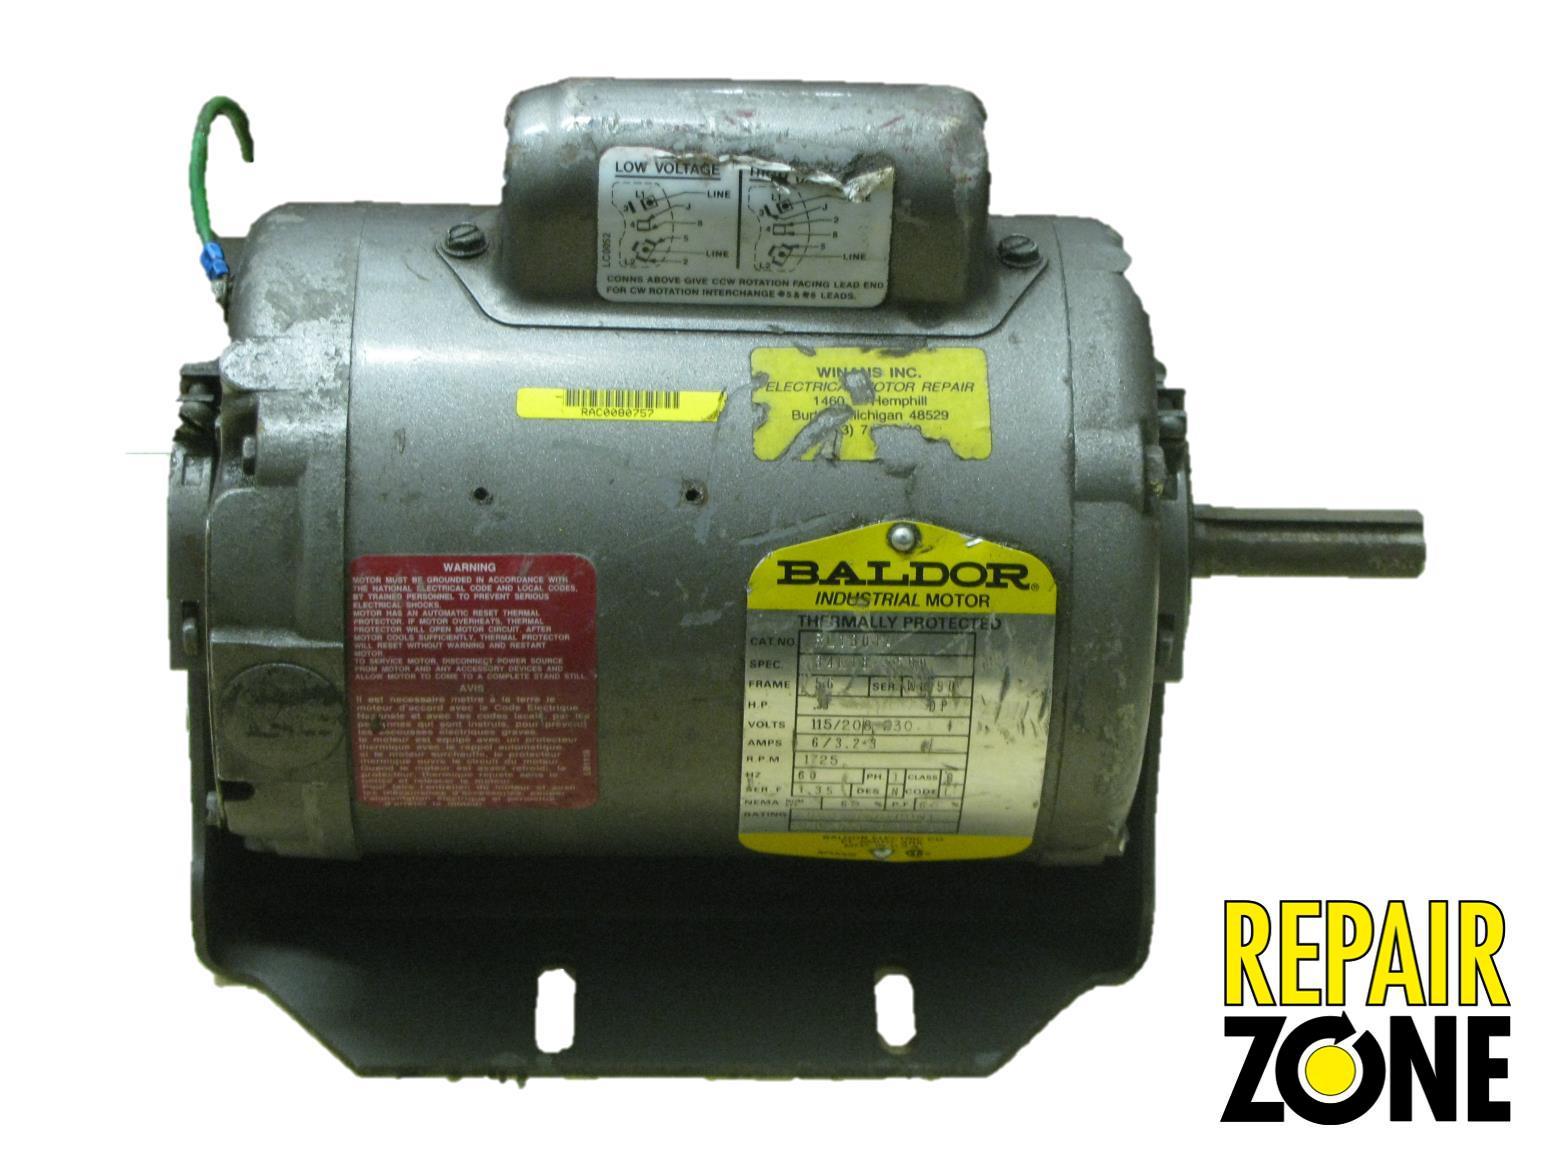 Rl1301a baldor single phase motor liquidation for Baldor single phase motor